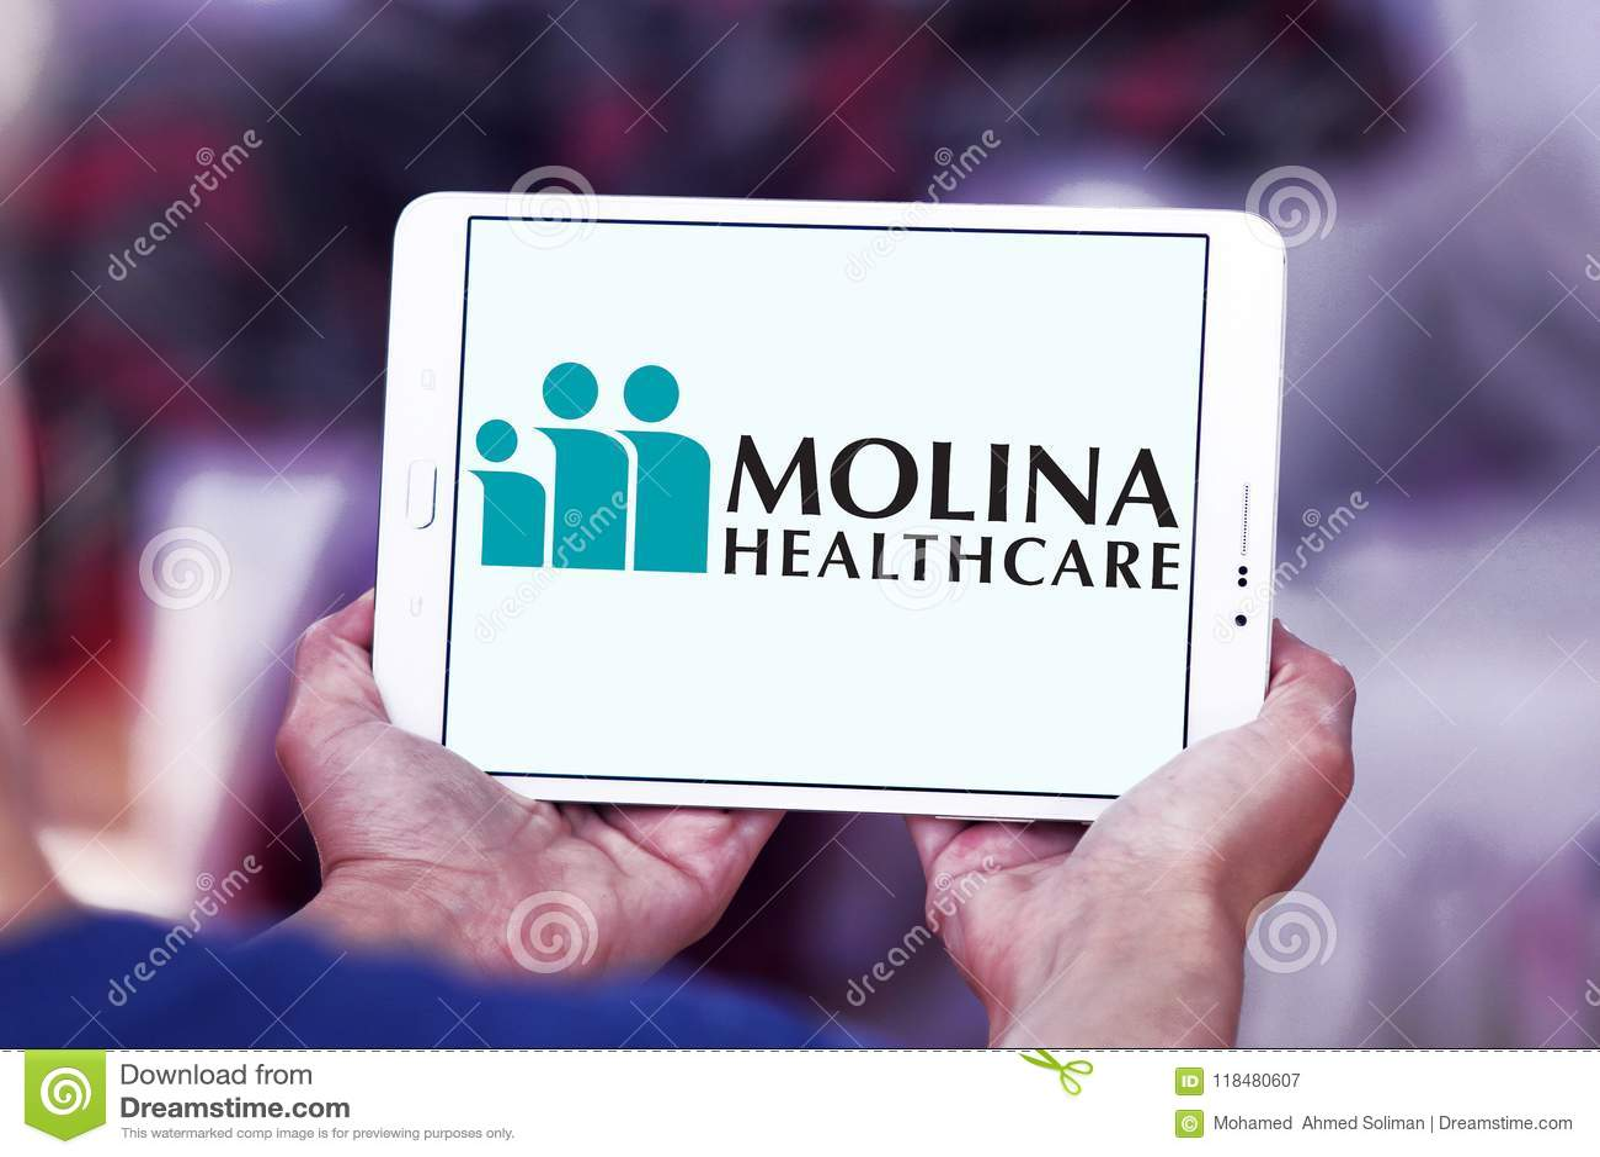 Компания здравоохранения Molina